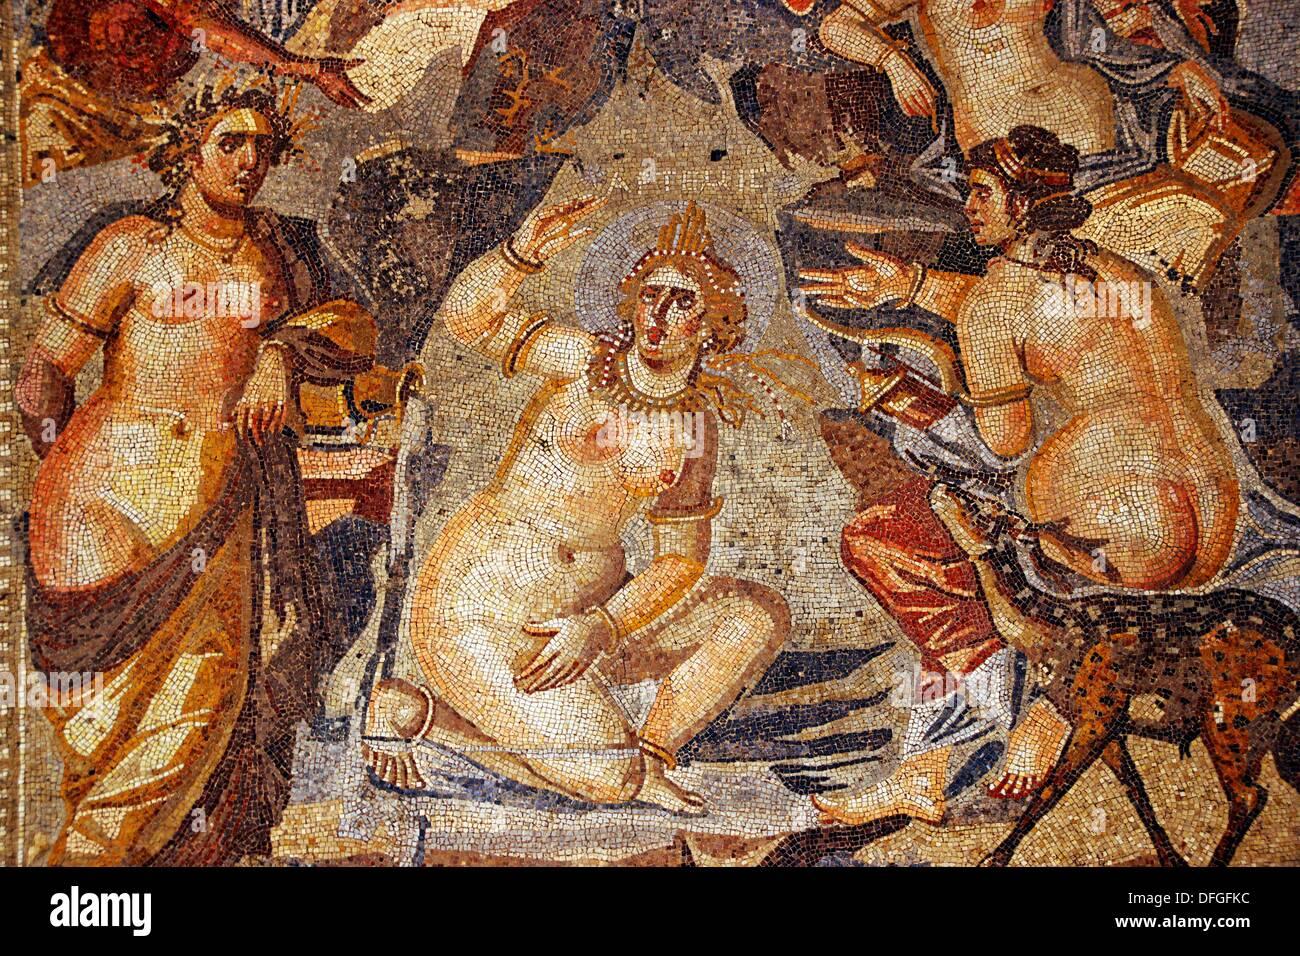 Detail of the mosaic of Artemis in the bath (3rd century), Museum of Suweida, Suweida, Hauran, Syria - Stock Image